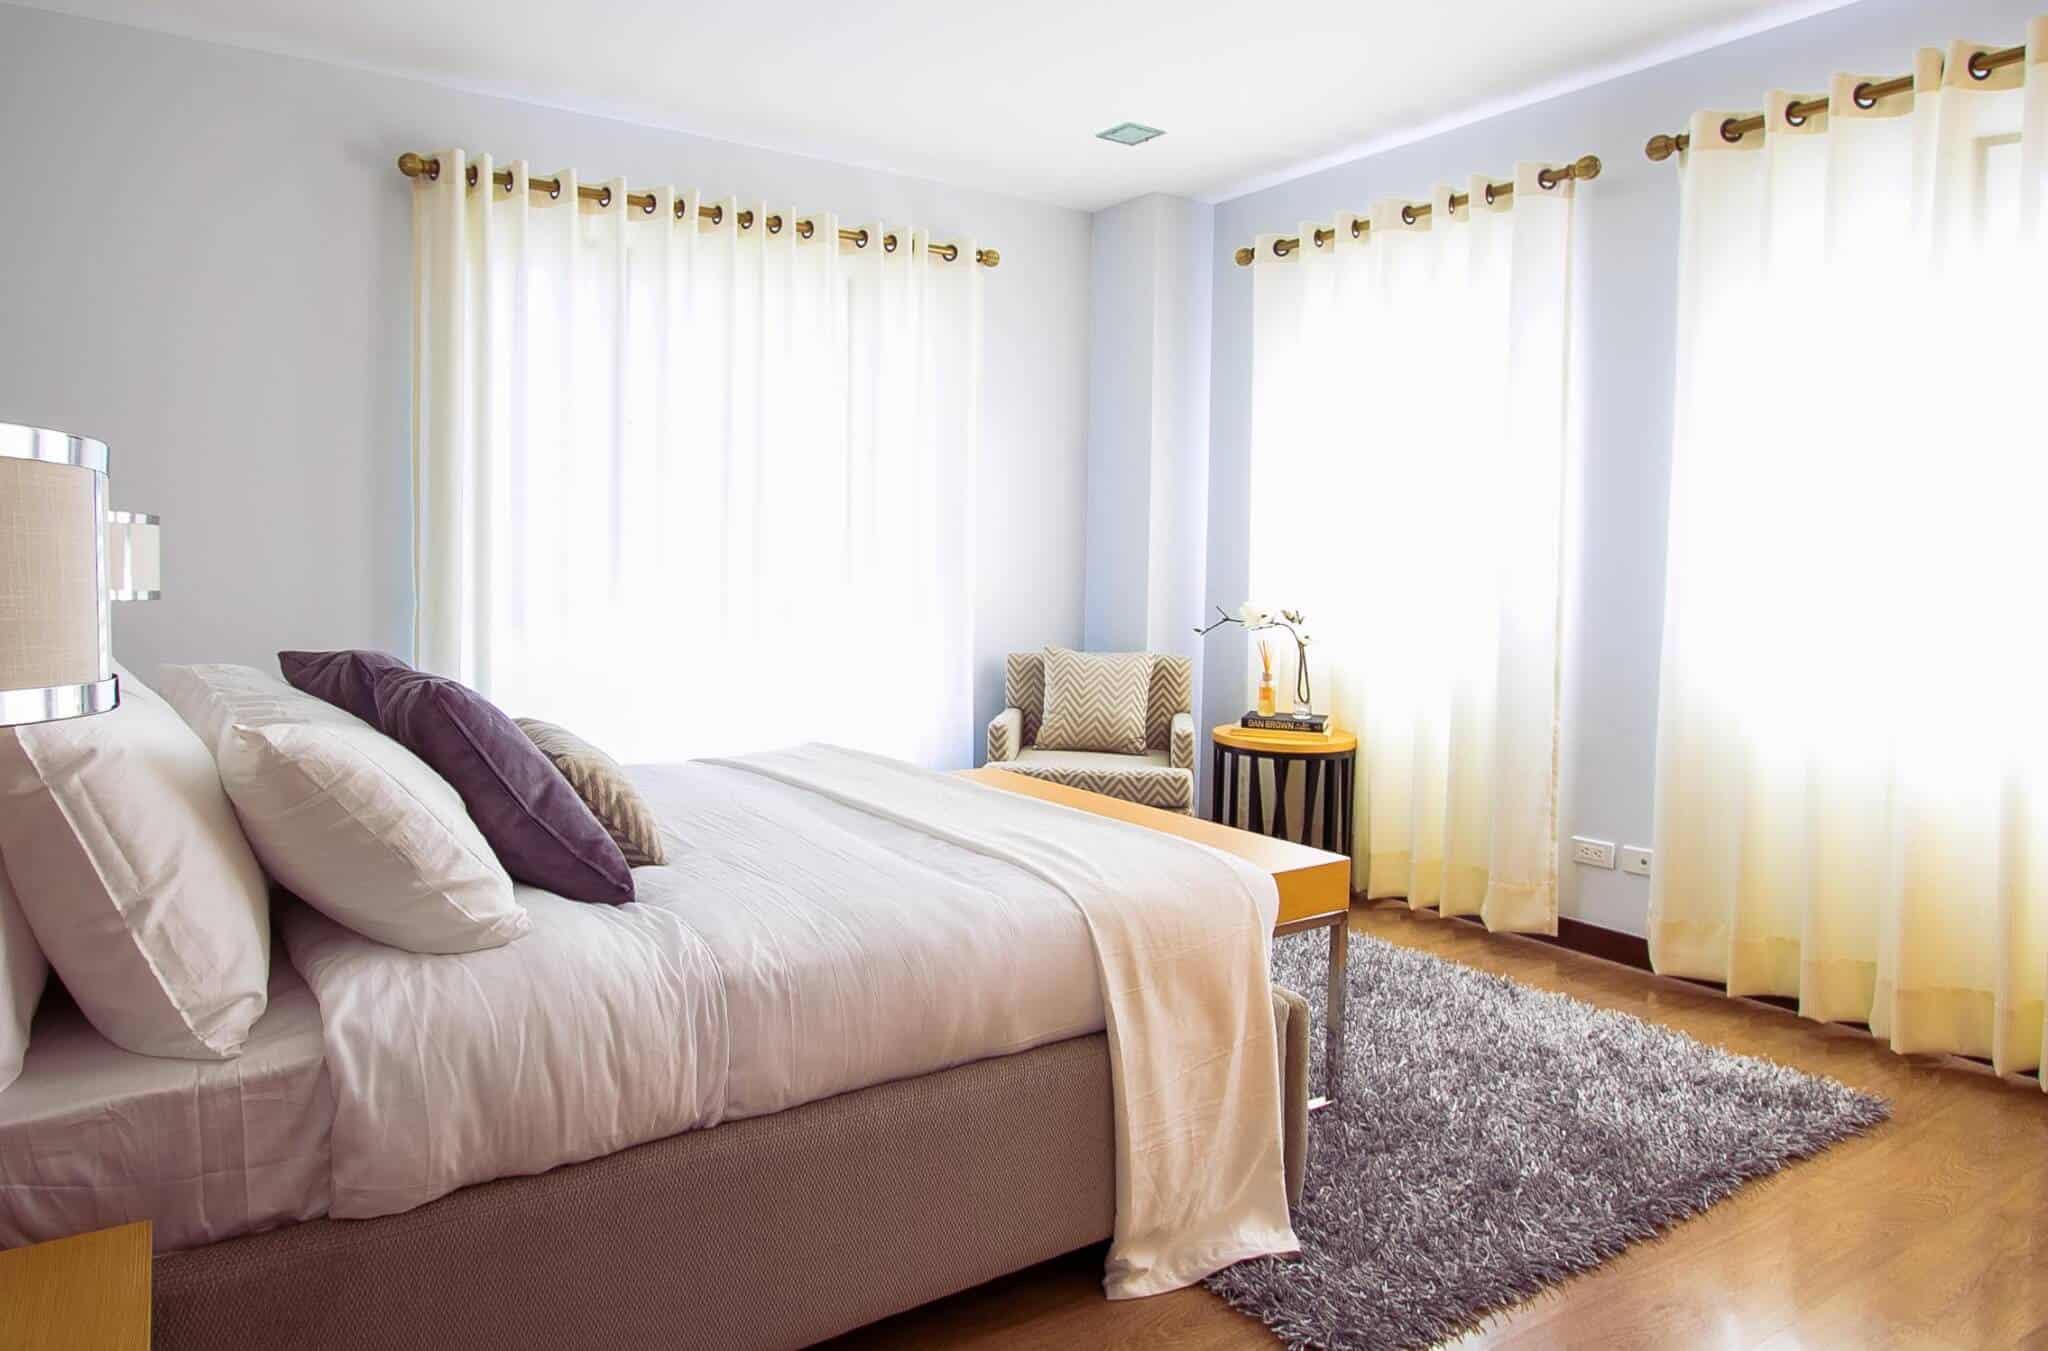 Decoración, tips, ideas, hogar, alfombra, habitación